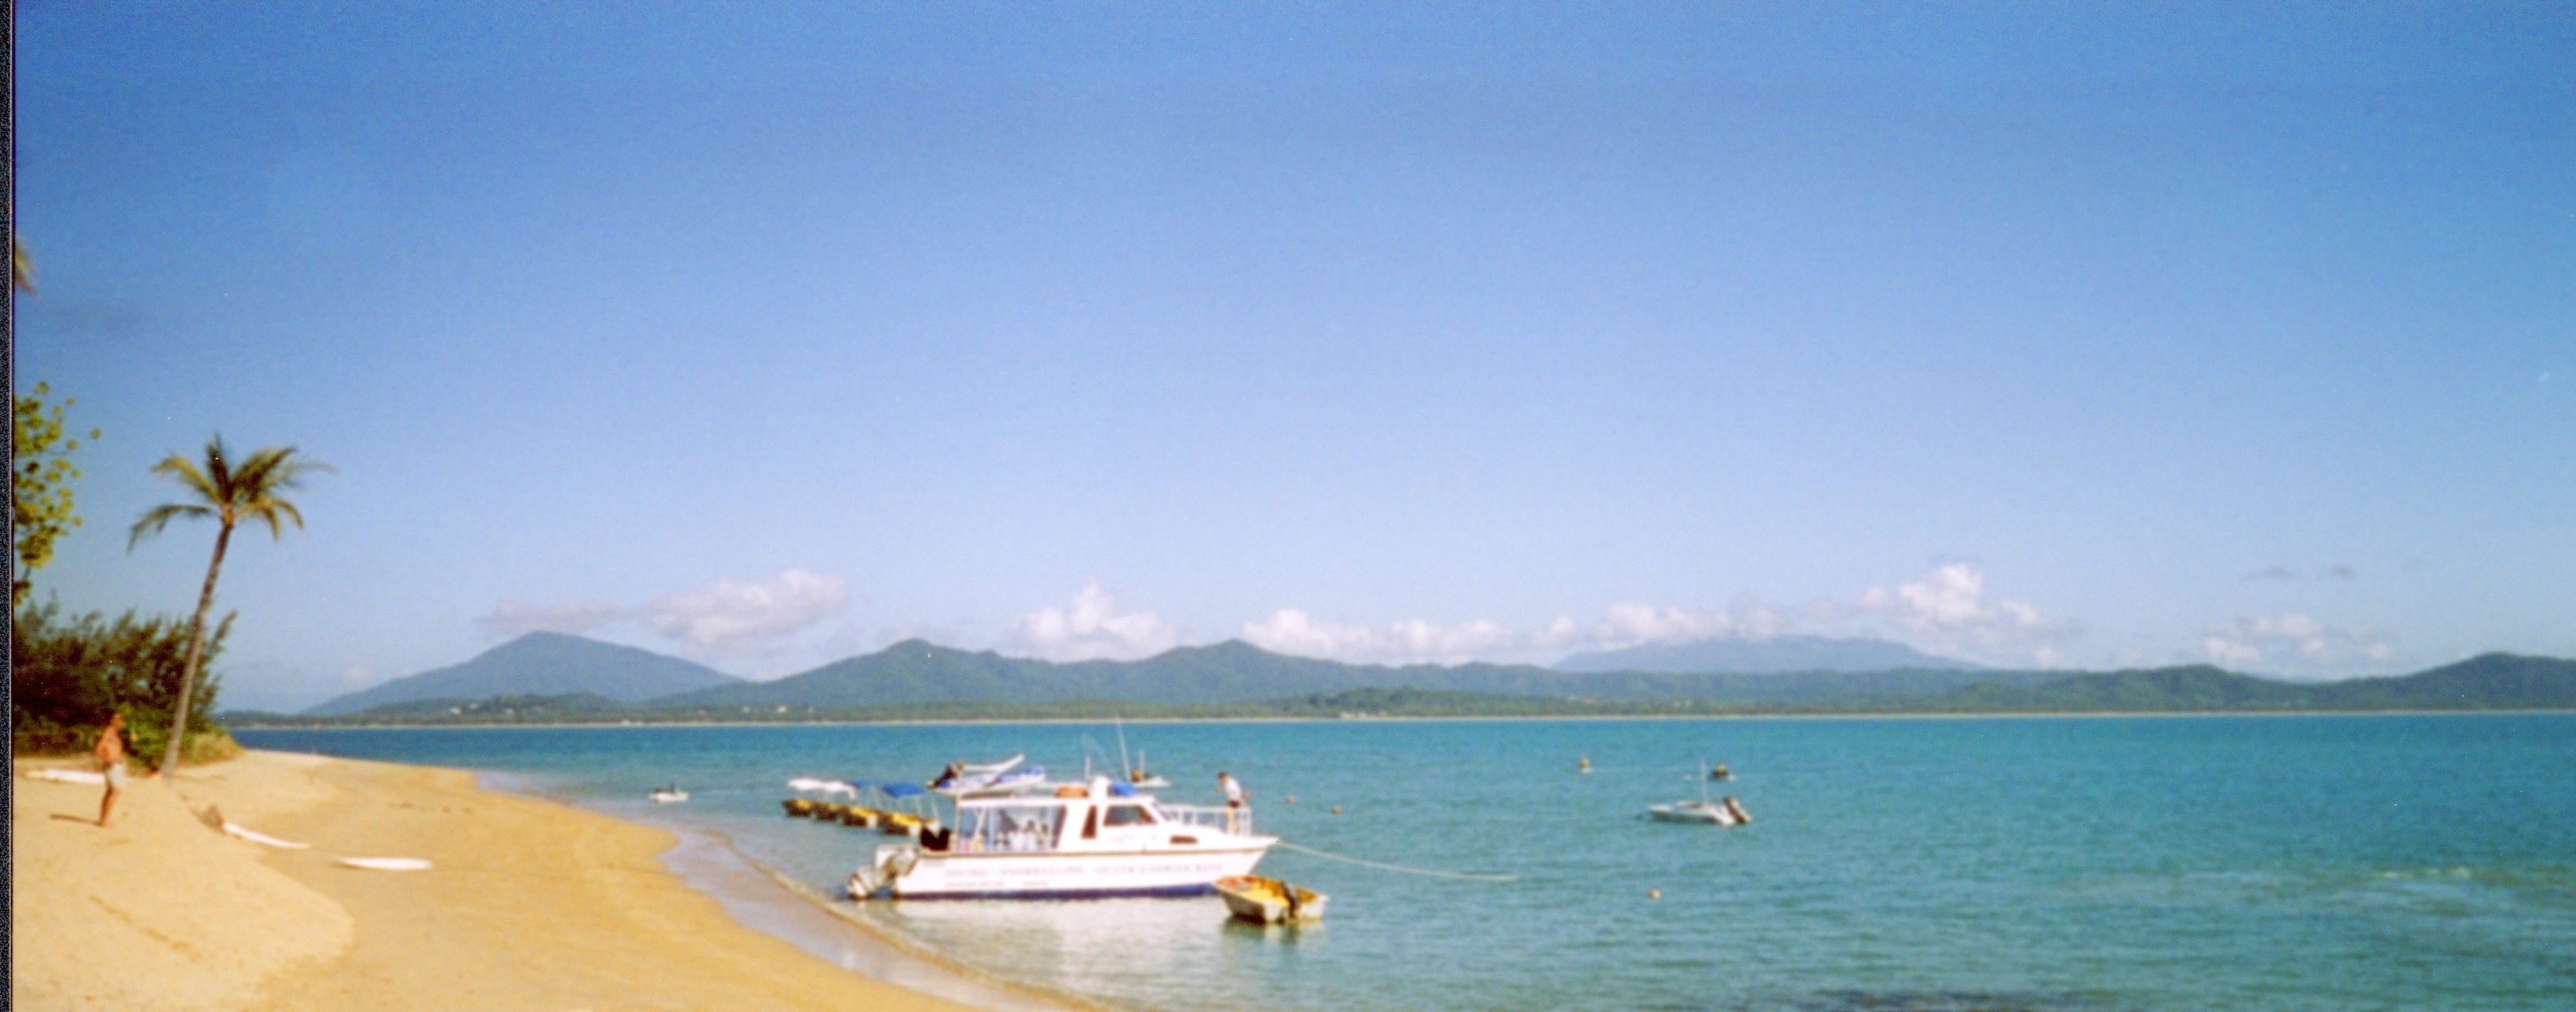 Dunk Island Australia: 301 Moved Permanently